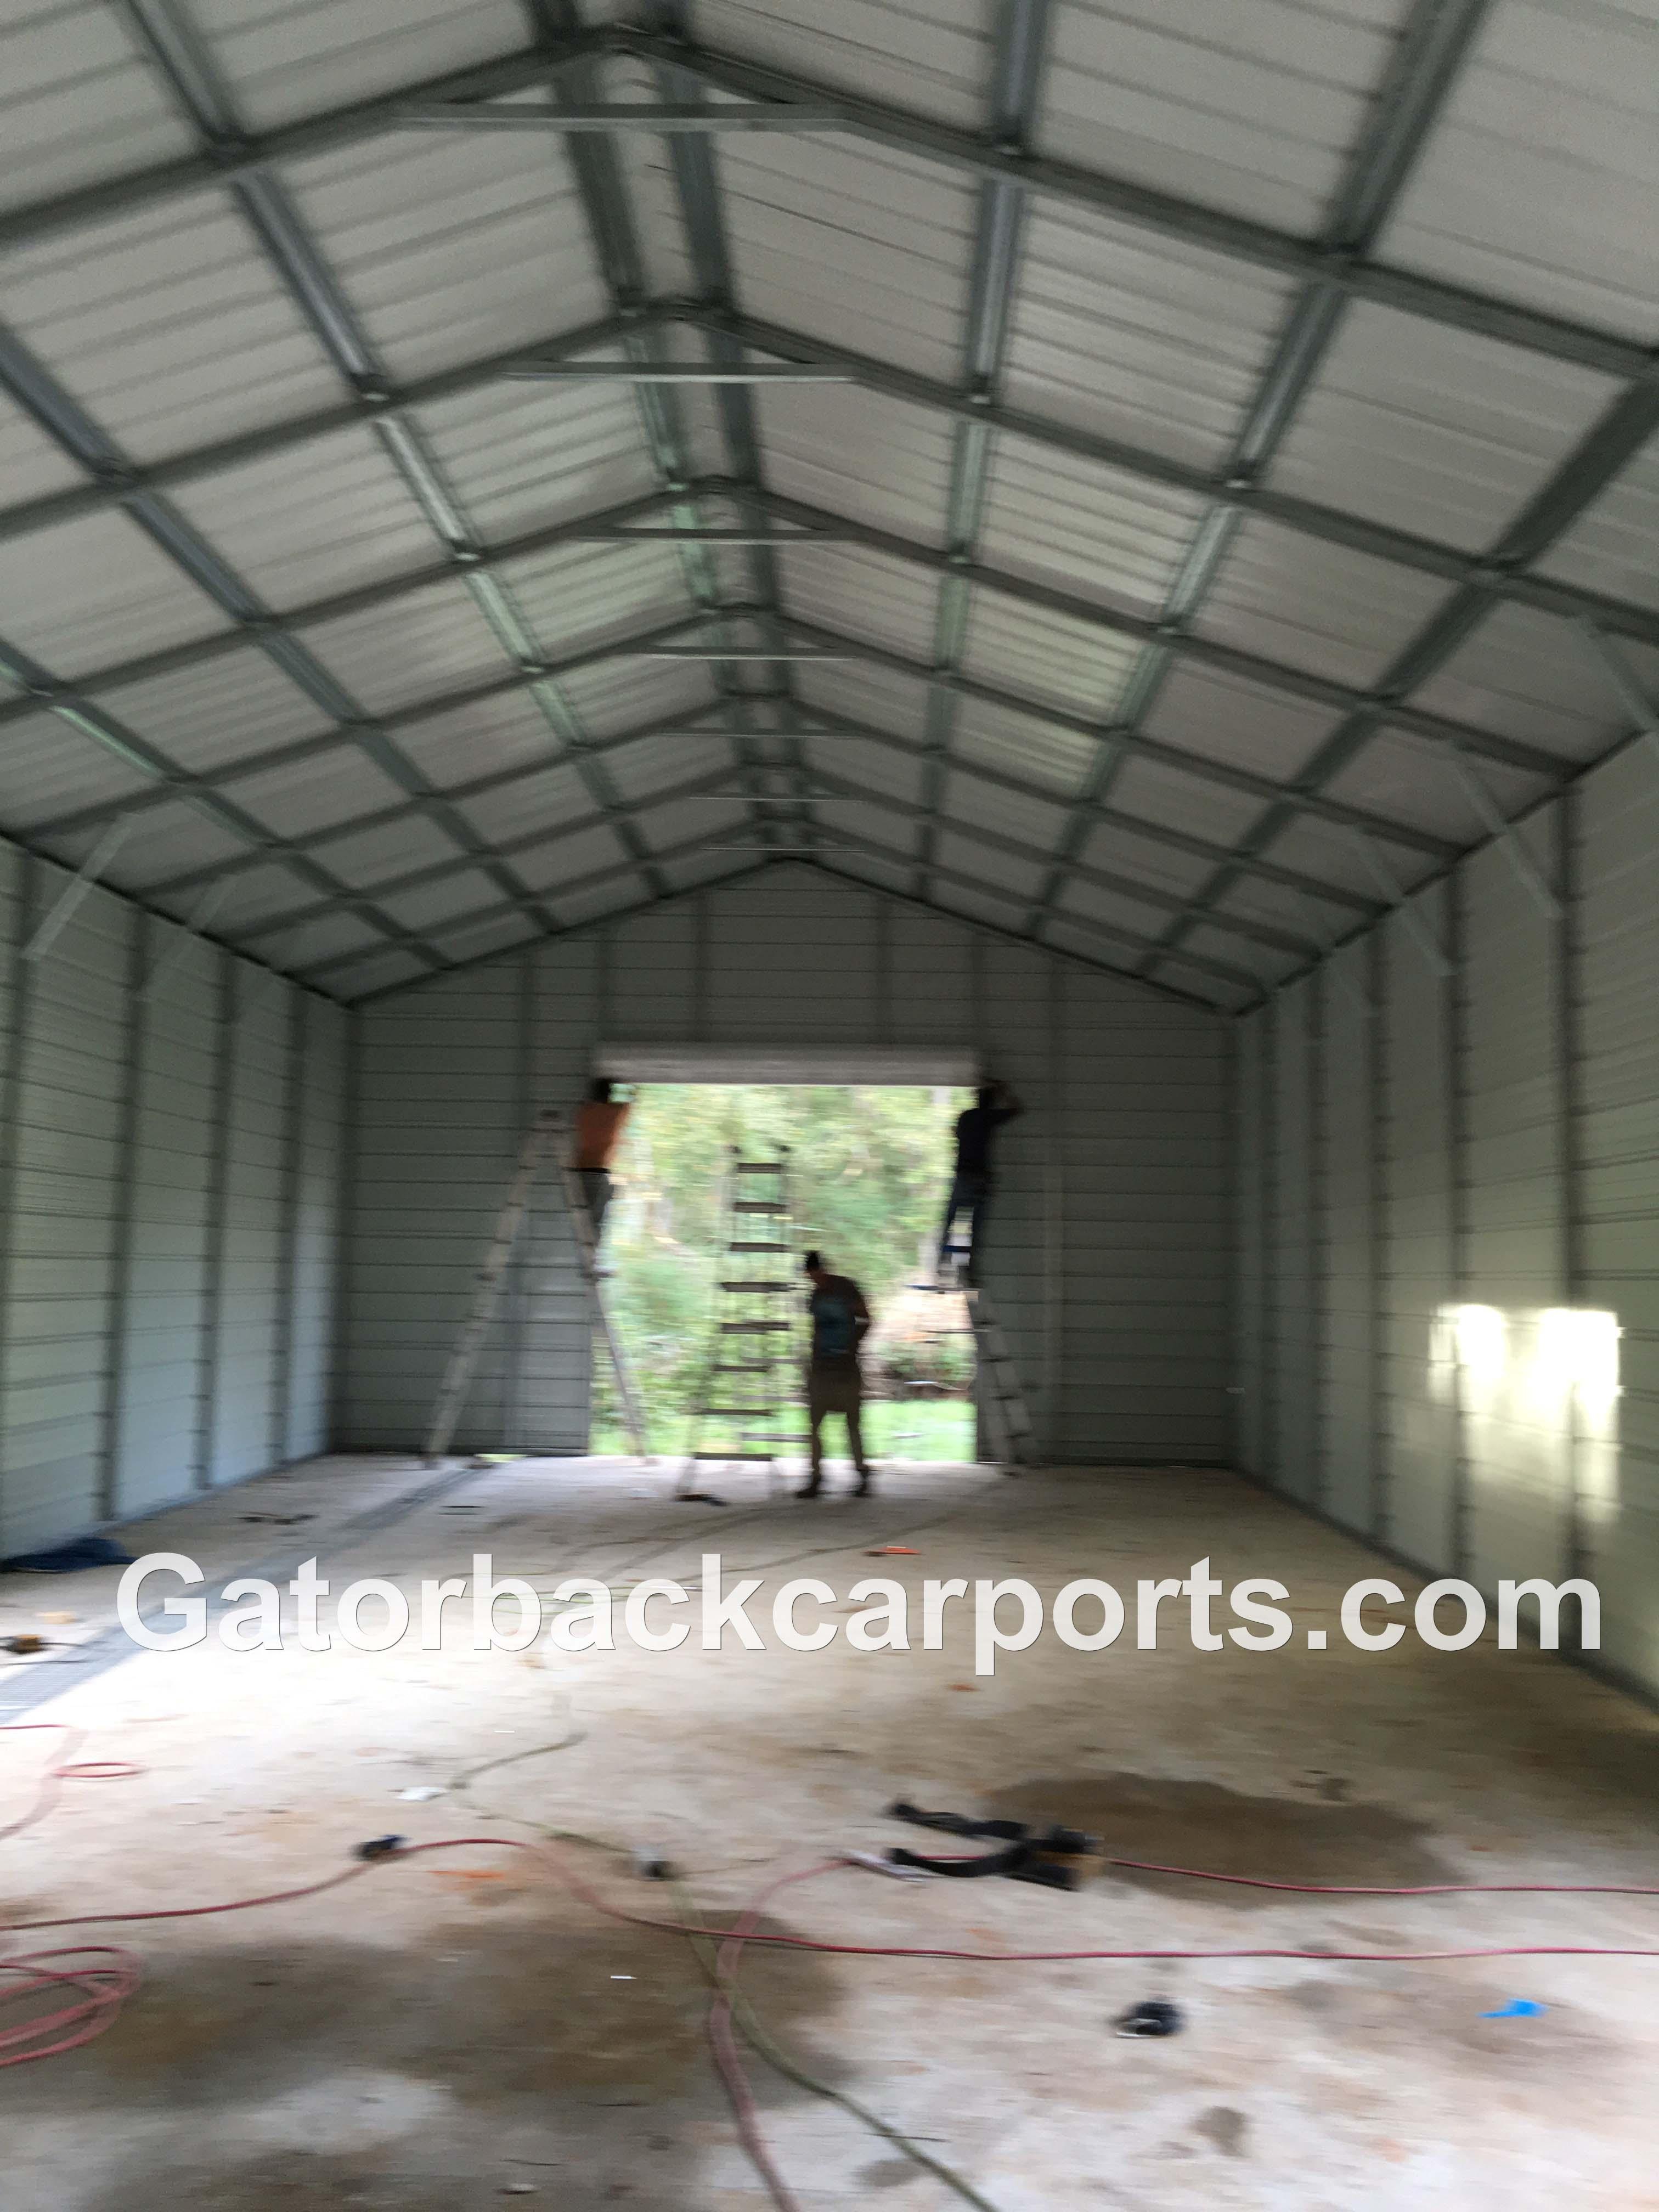 Look Inside A Steel Garage Job Gatorback Carports